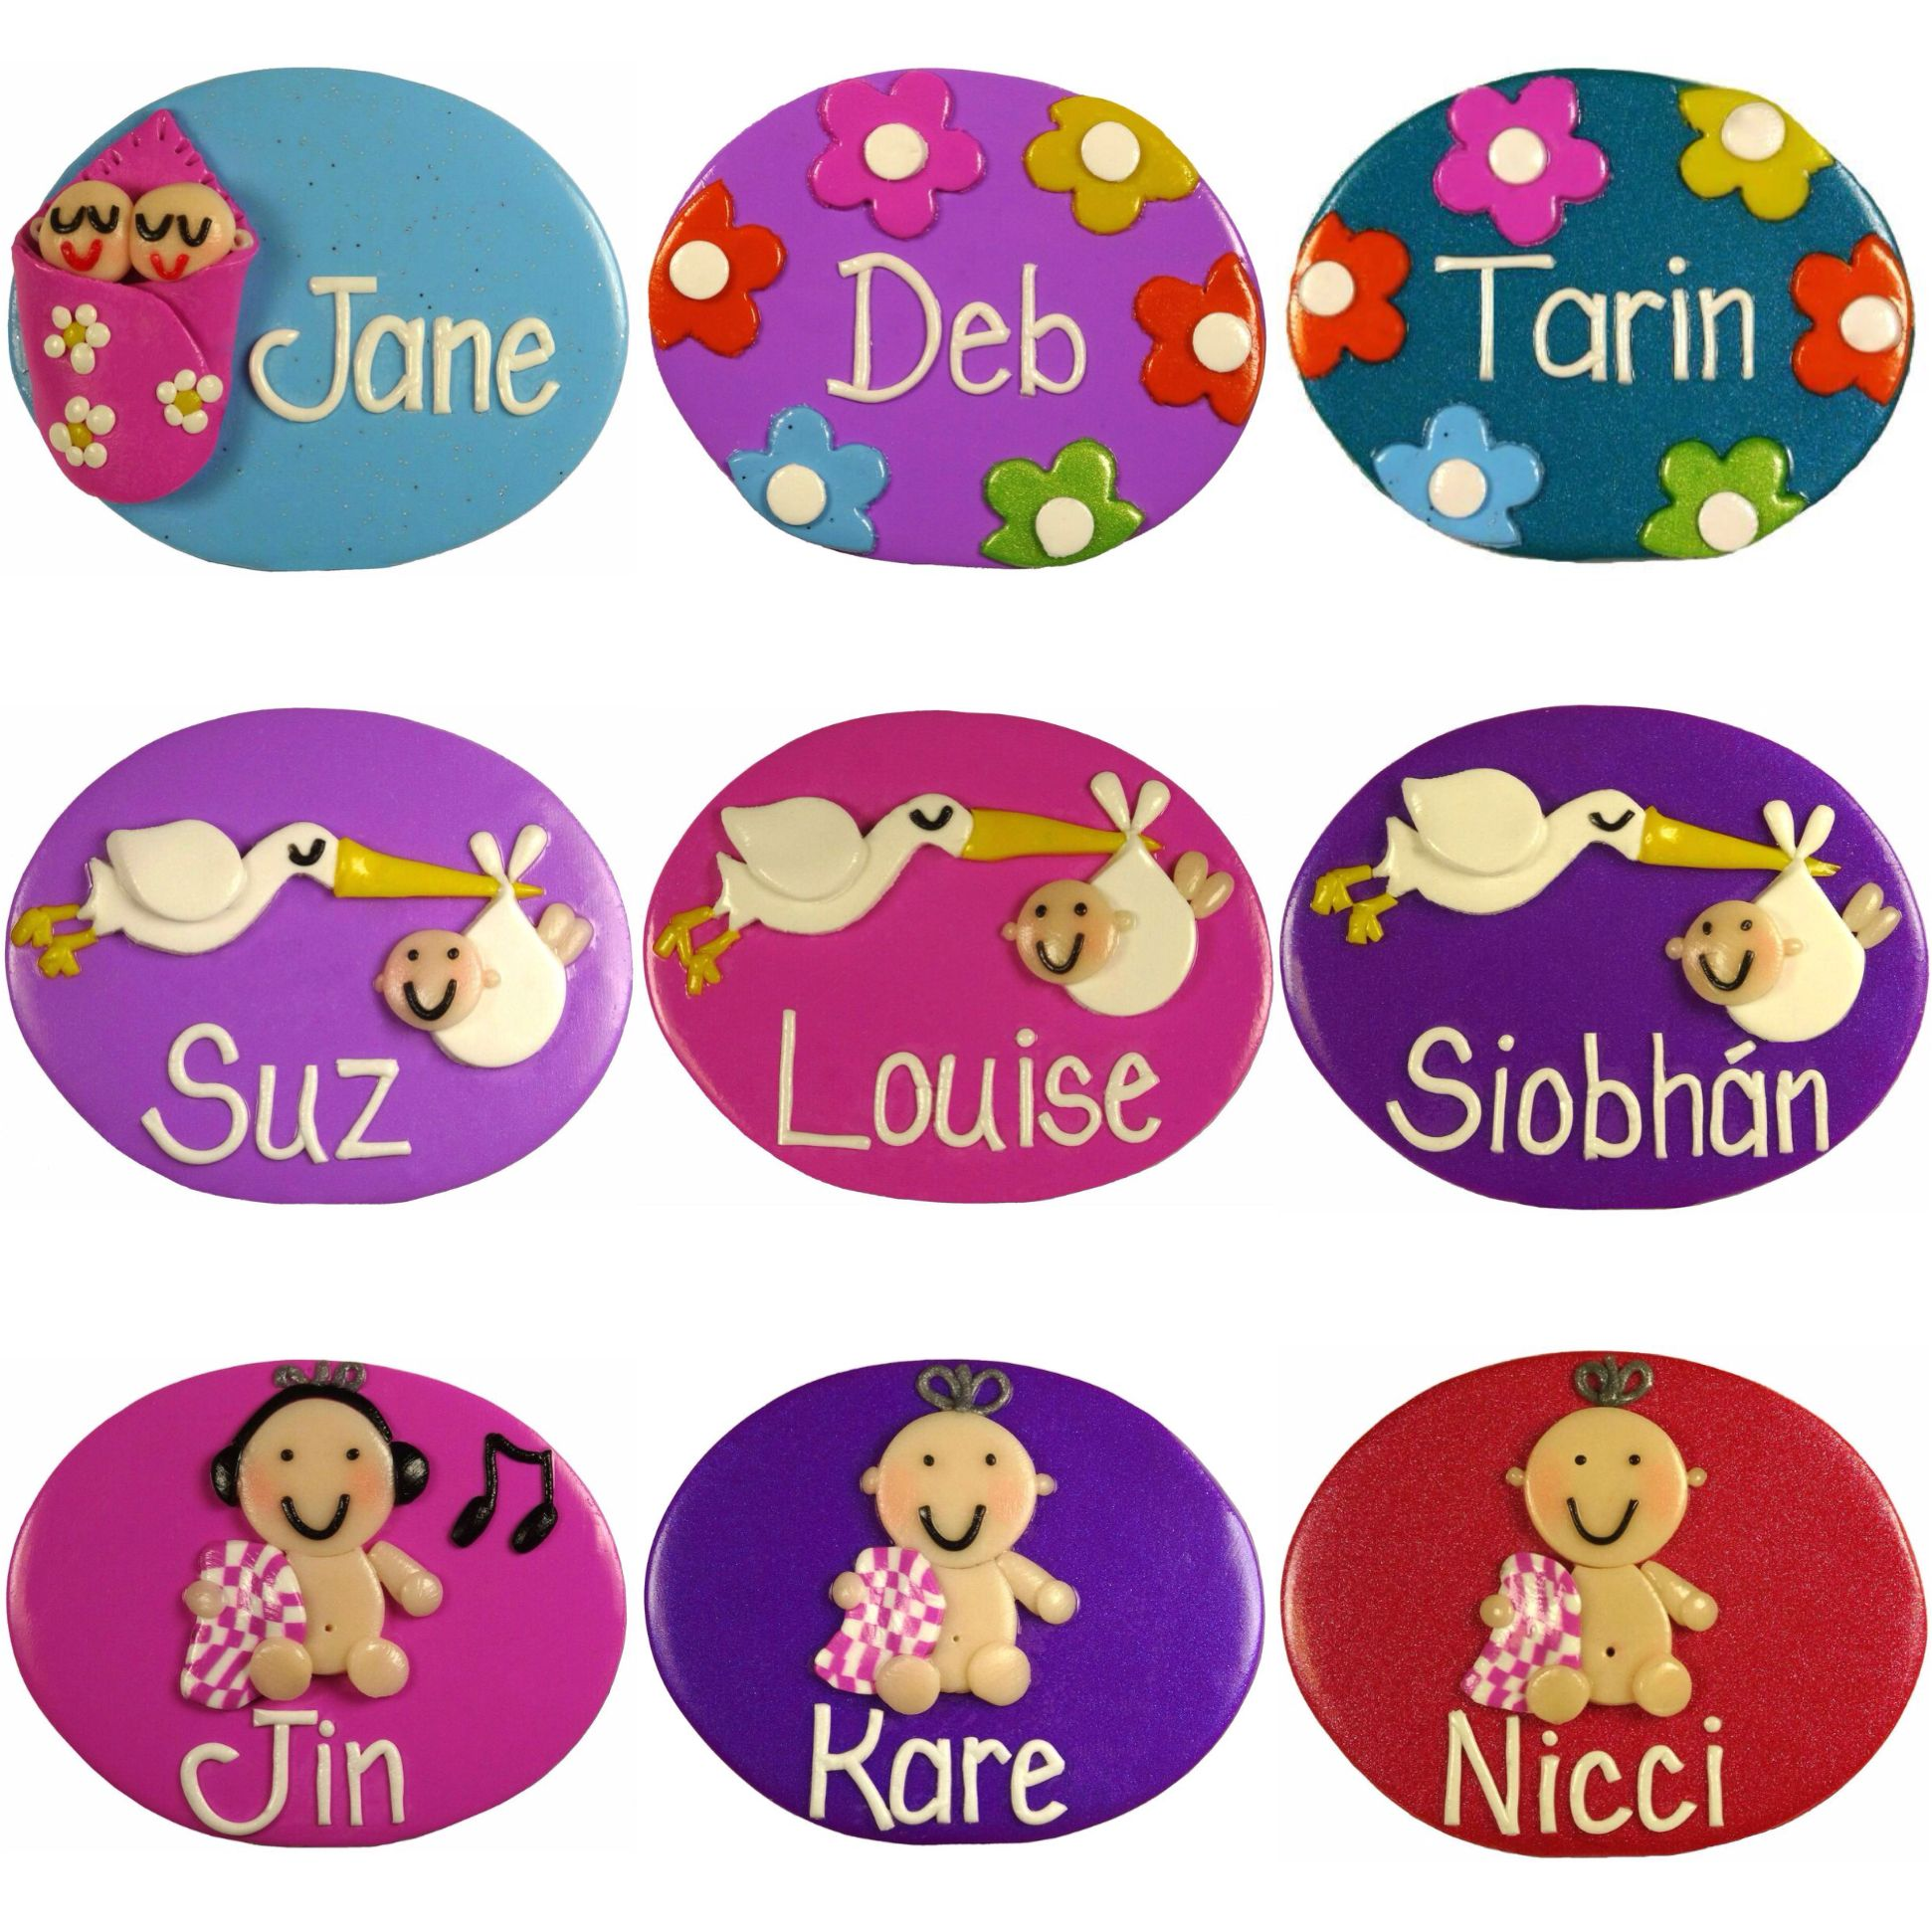 Nurse Name Badges Twins In Blanket, Flowers A, Stork